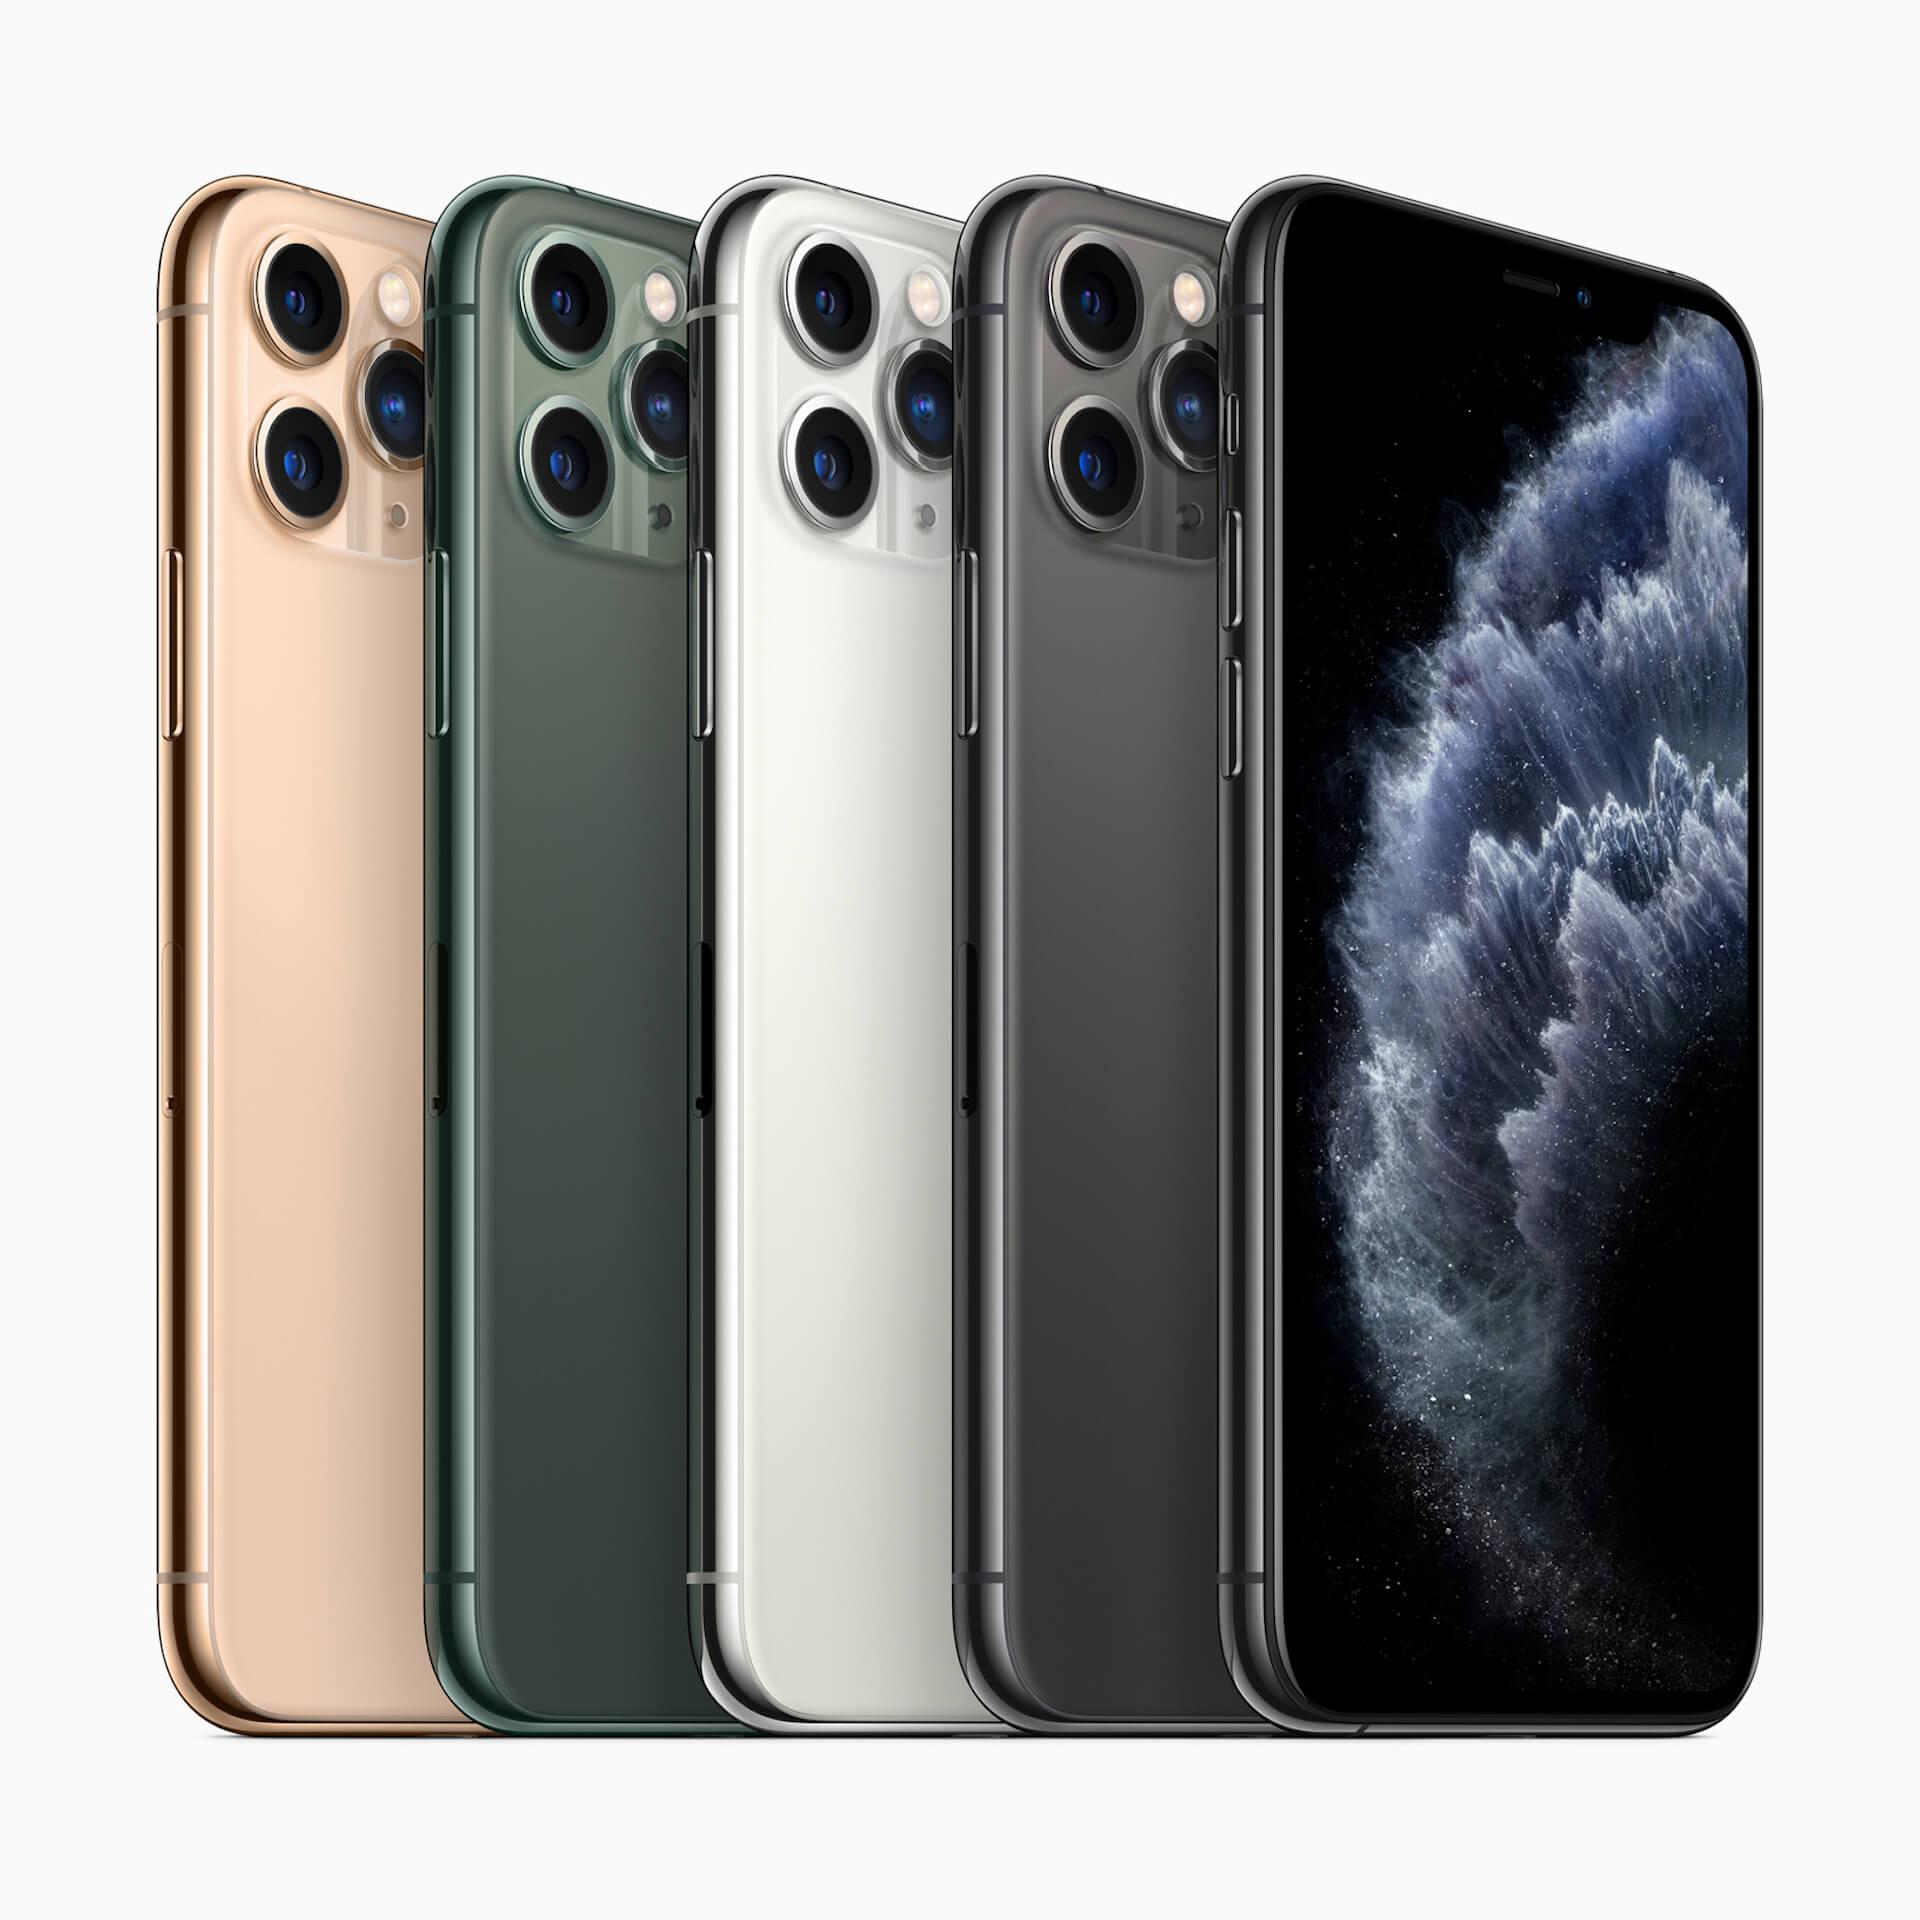 Apple、5G対応のiPhoneを2020年秋に発表か? tech200116_iphone_5g_main